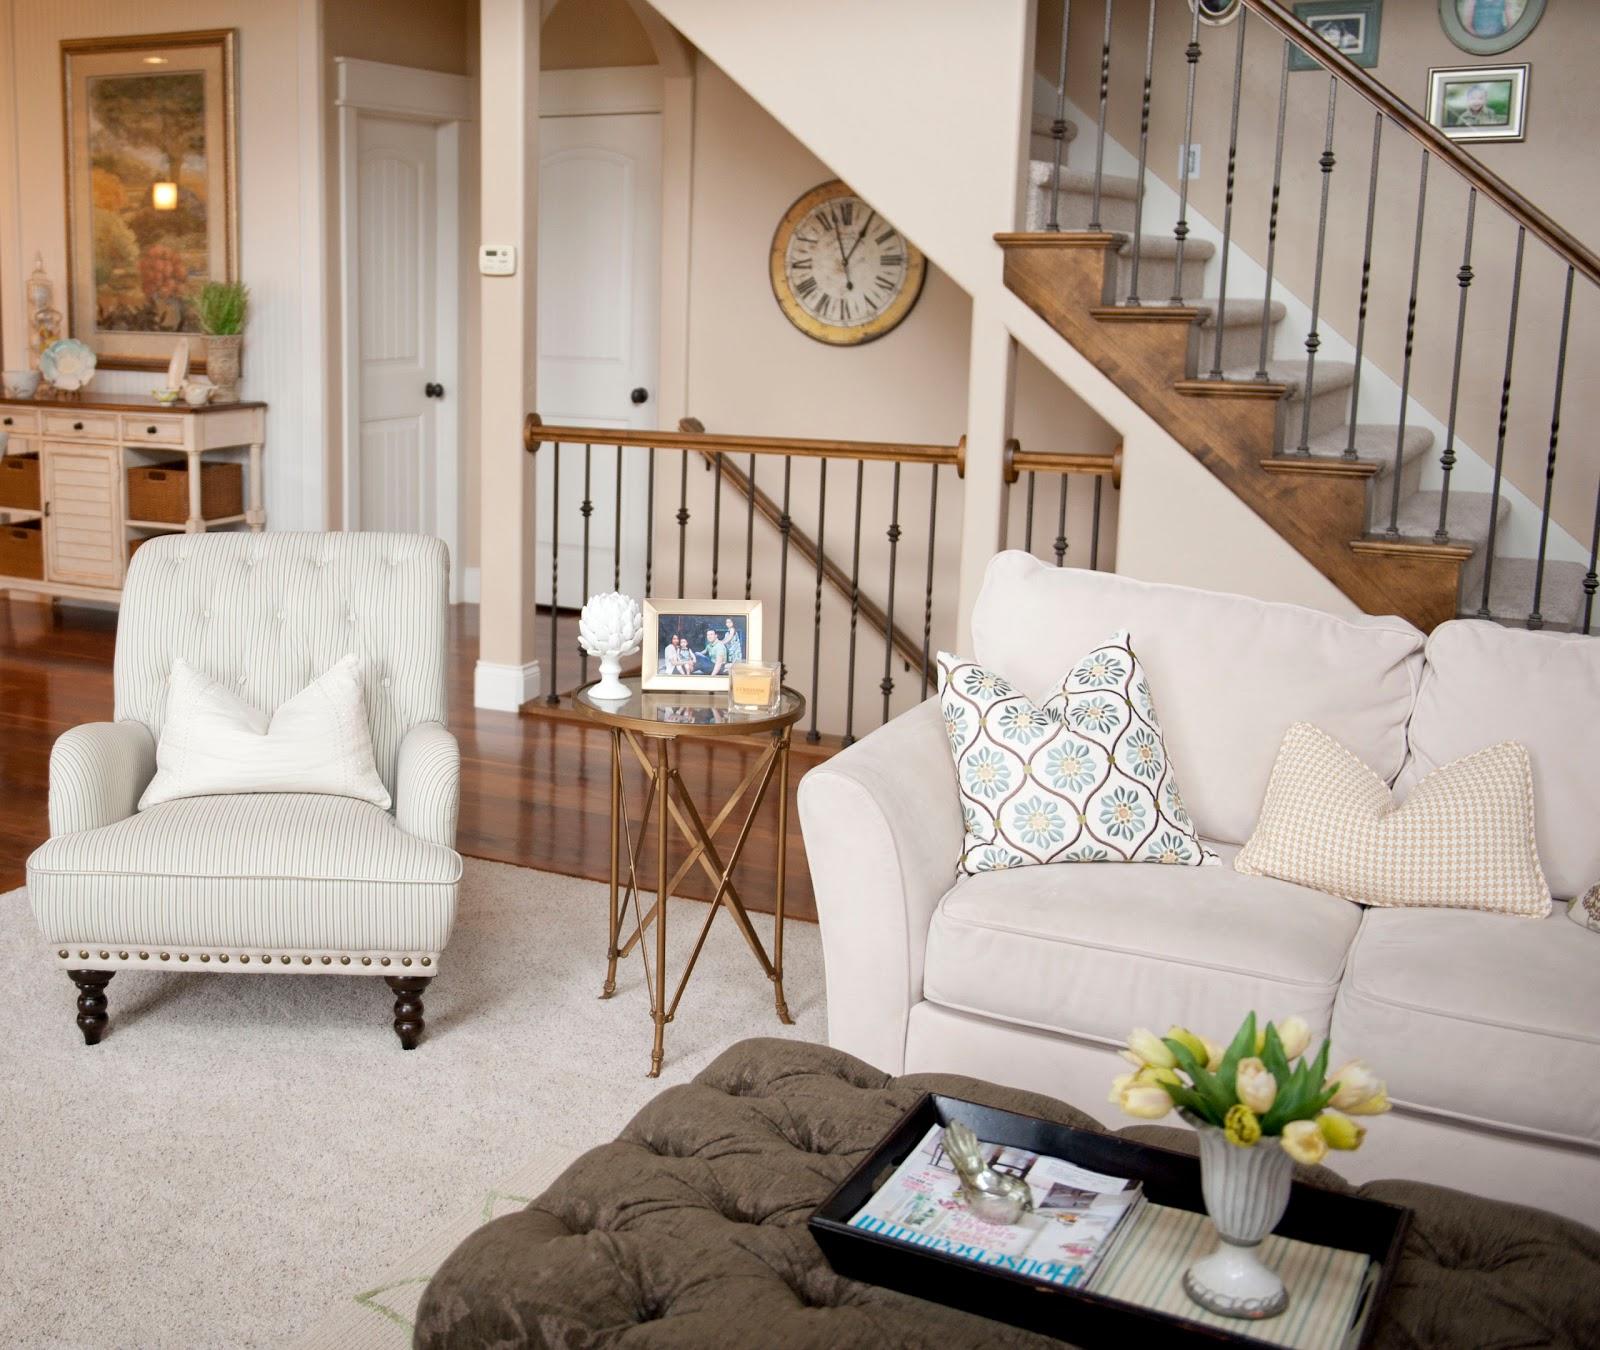 Sita Montgomery Interiors: My Home Tour: Family Room